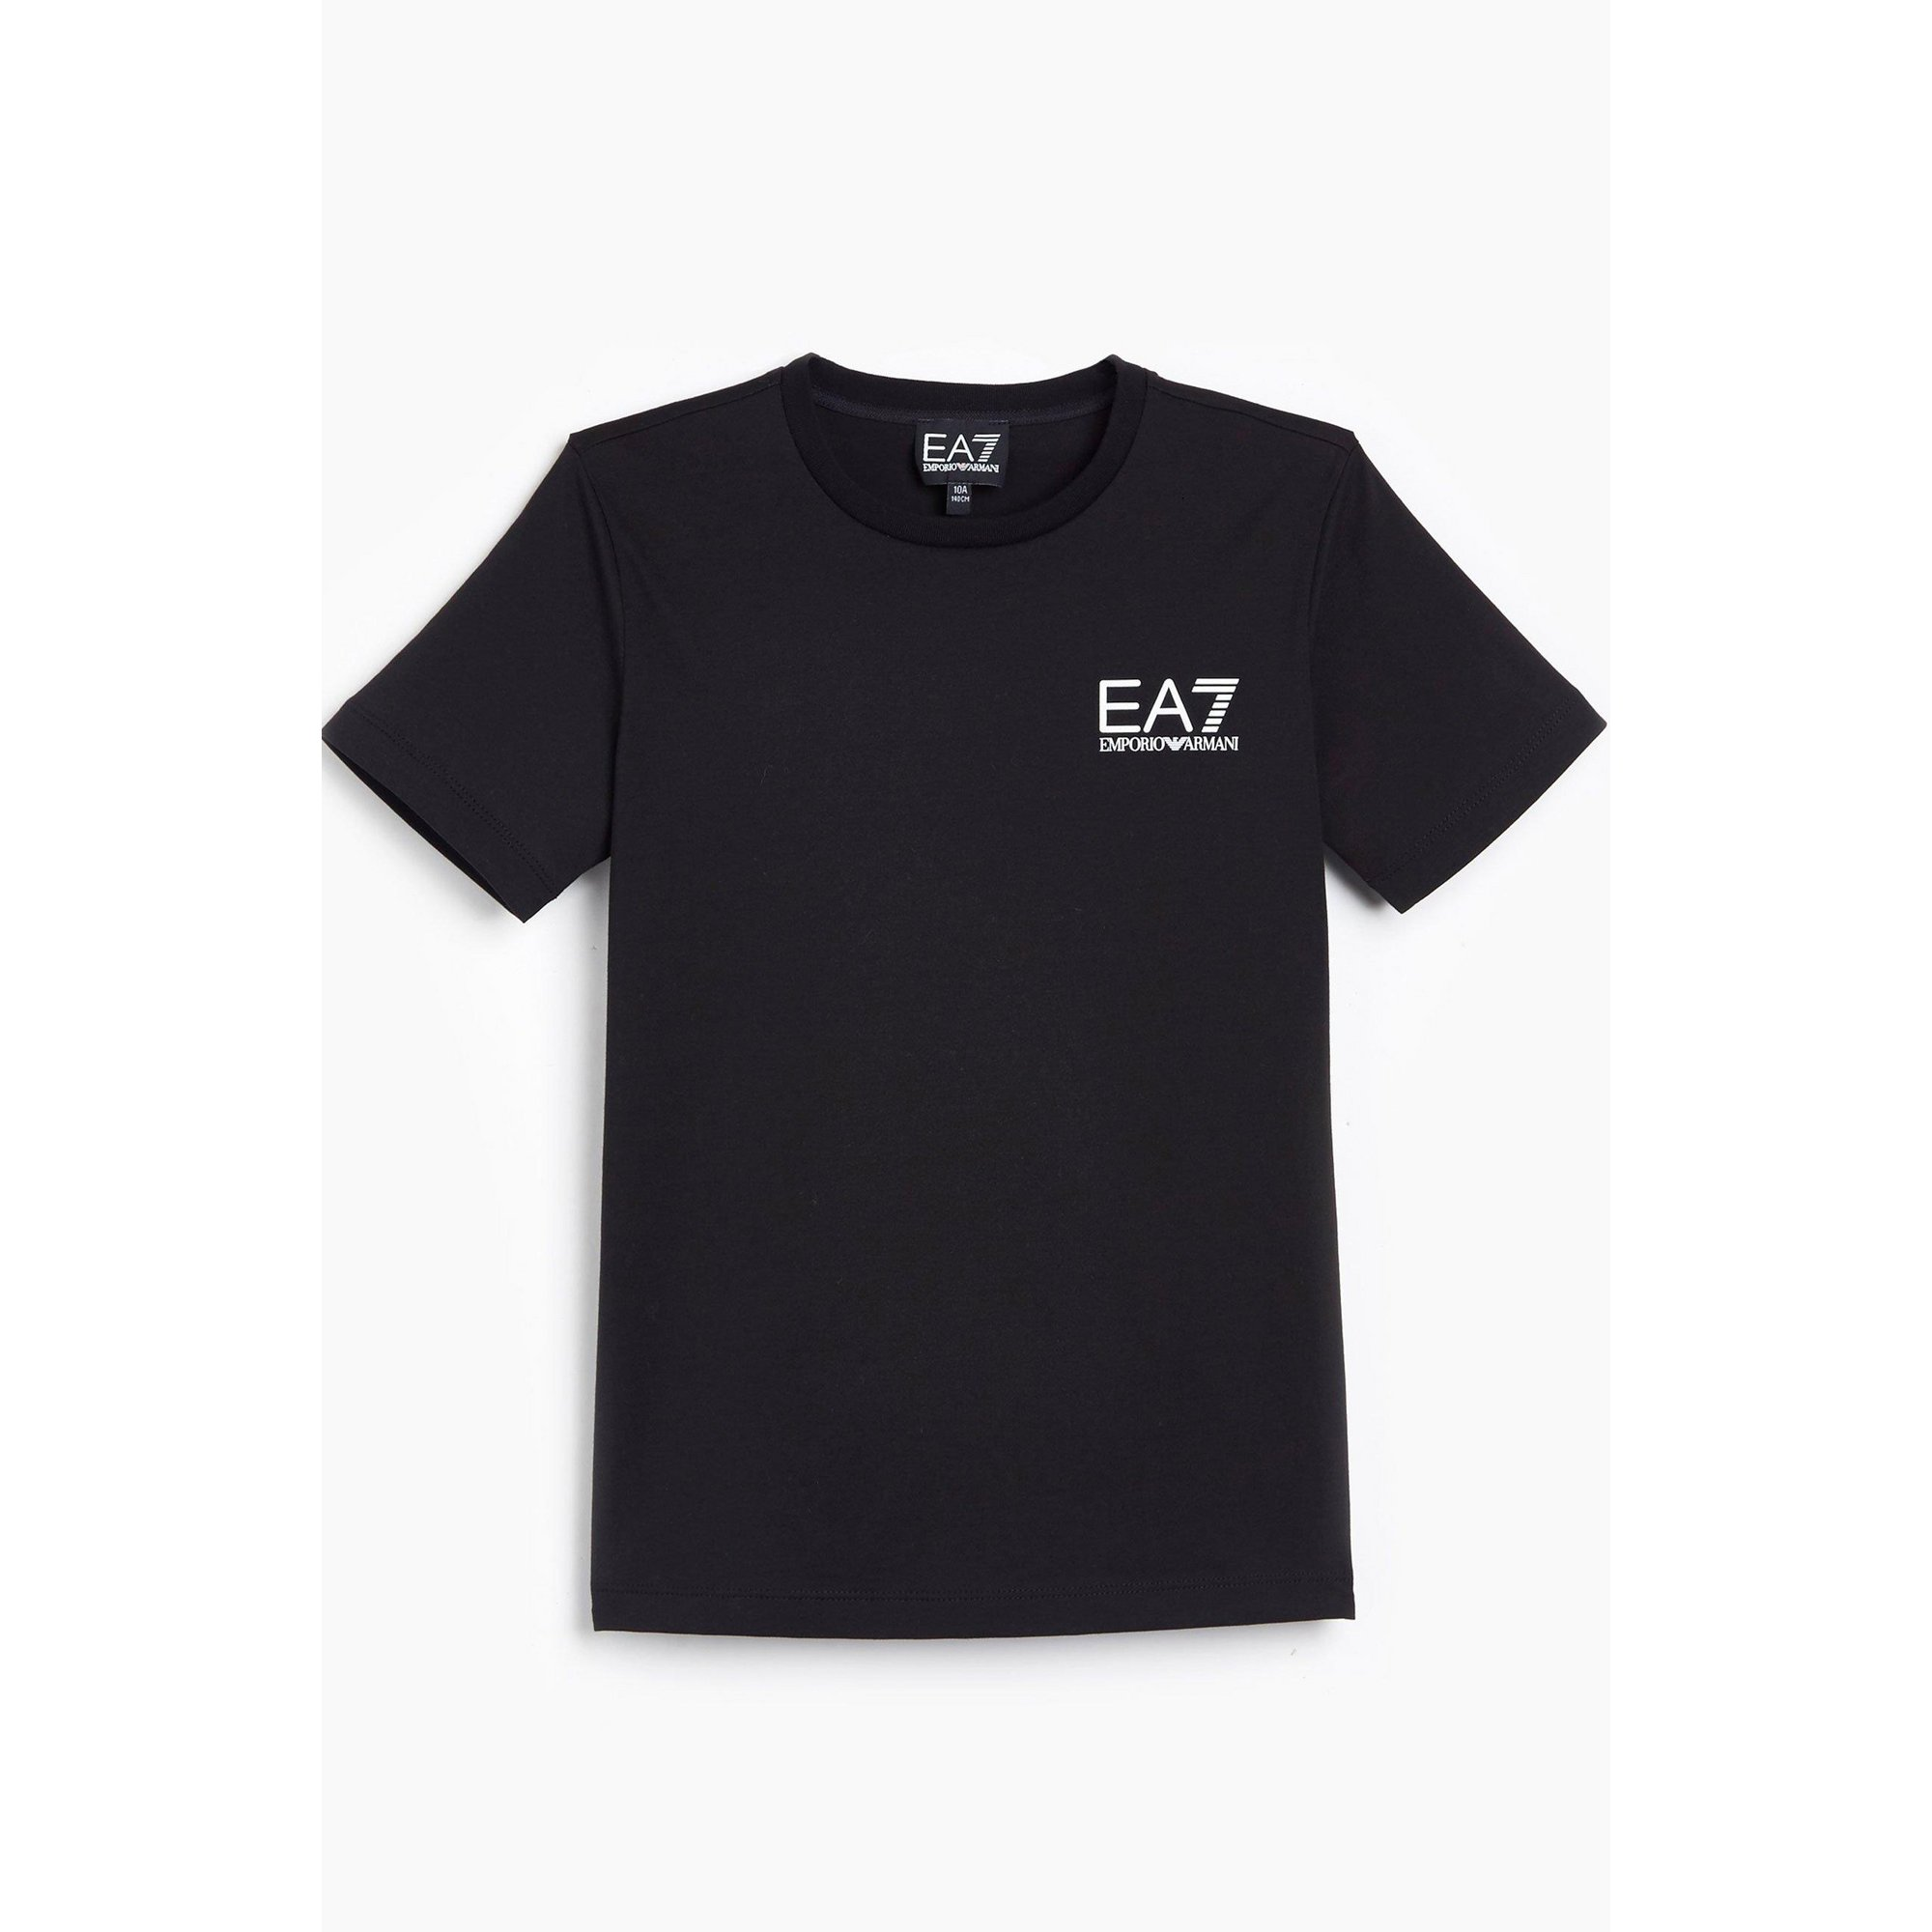 Image of Boys EA7 Train Core ID Black T-Shirt